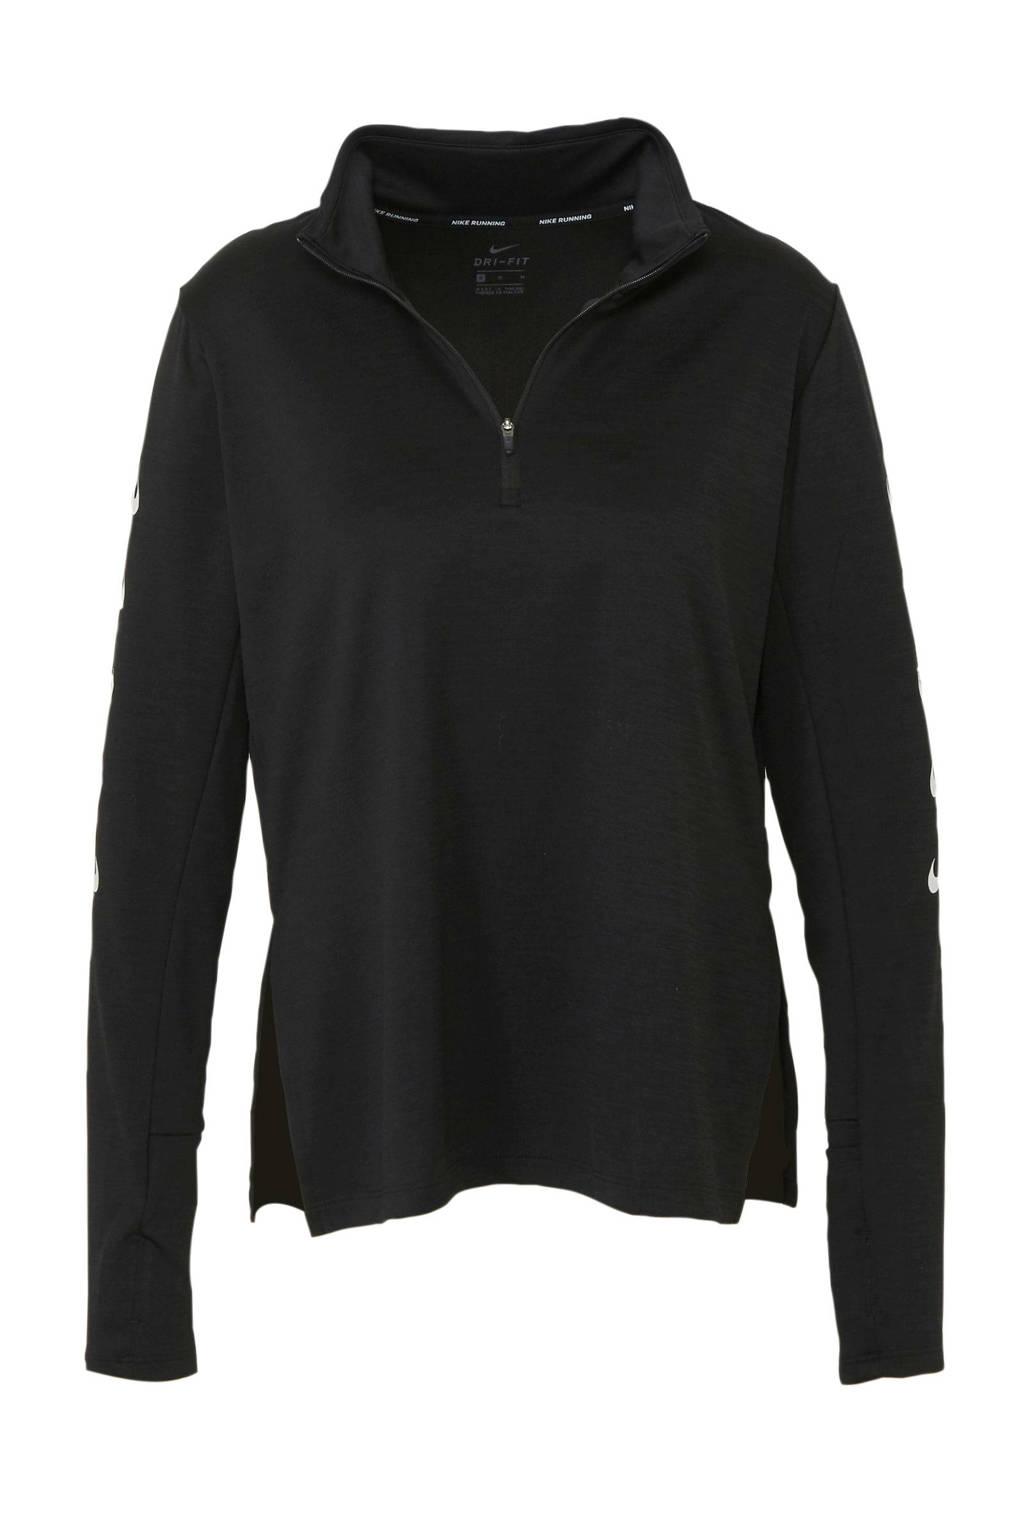 Nike hardloop T-shirt zwart, Zwart